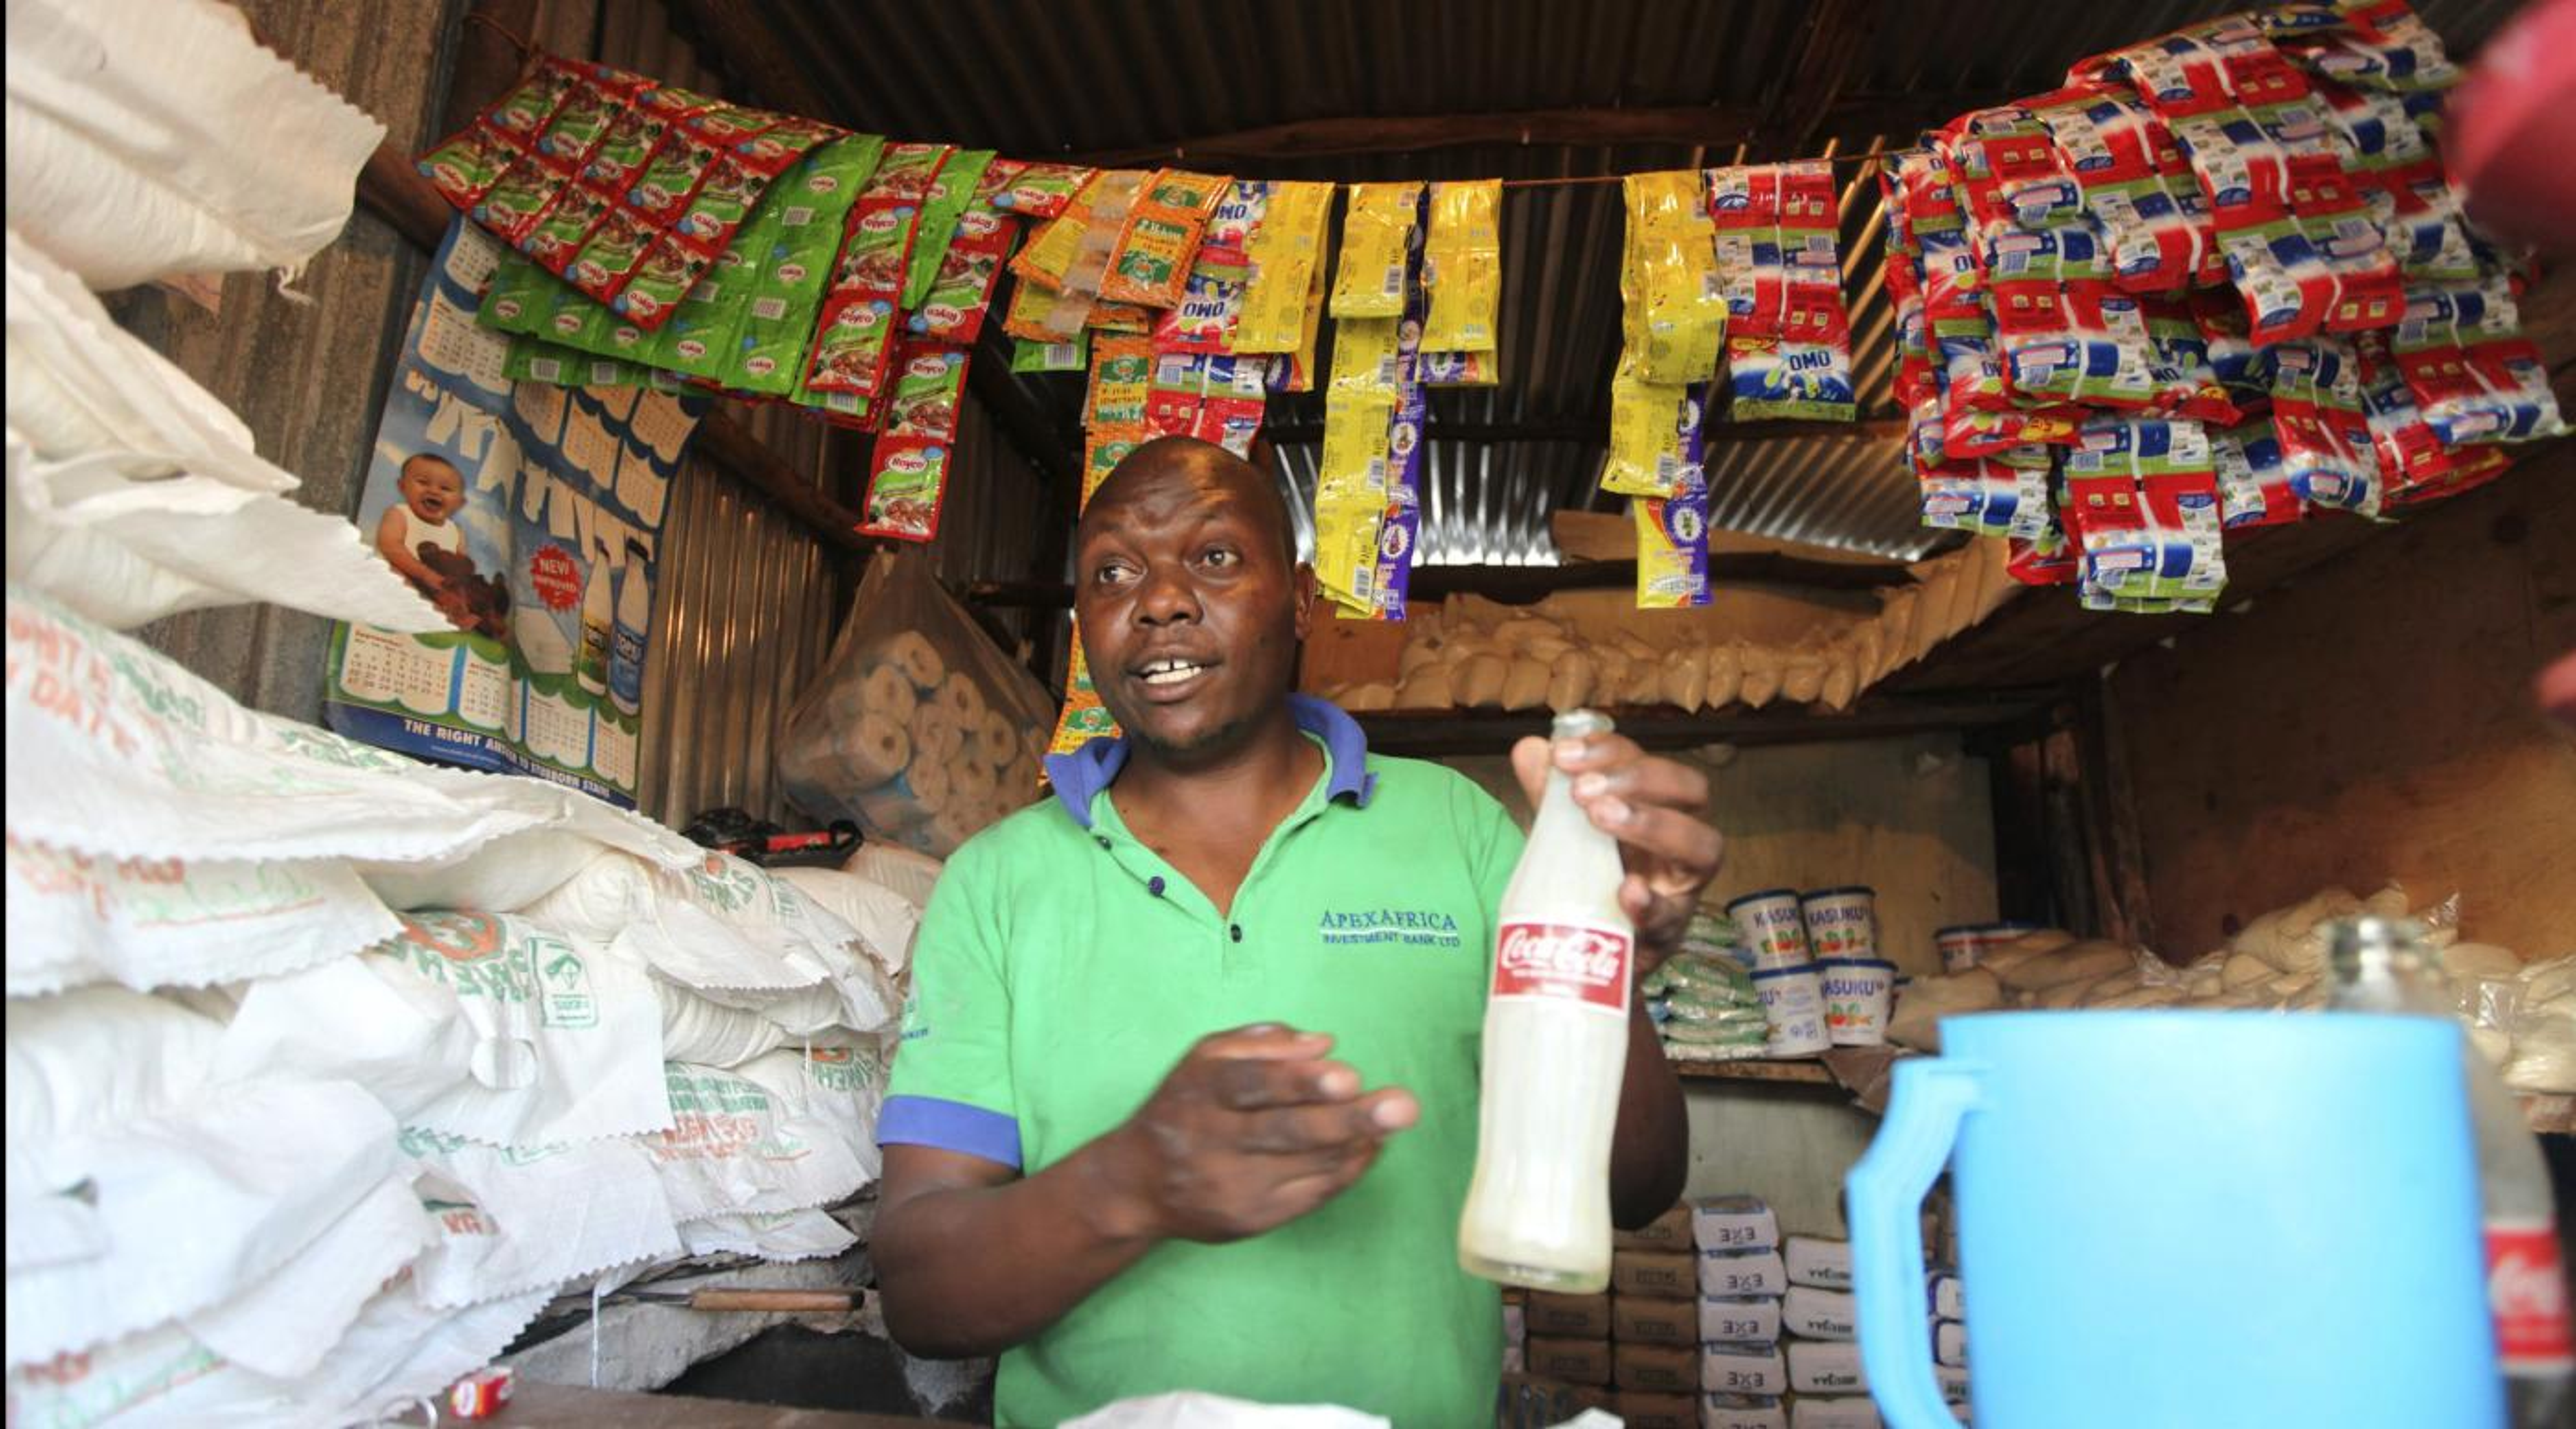 East African B2B retail platform Sokowatch has closed a $14 million Series A funding